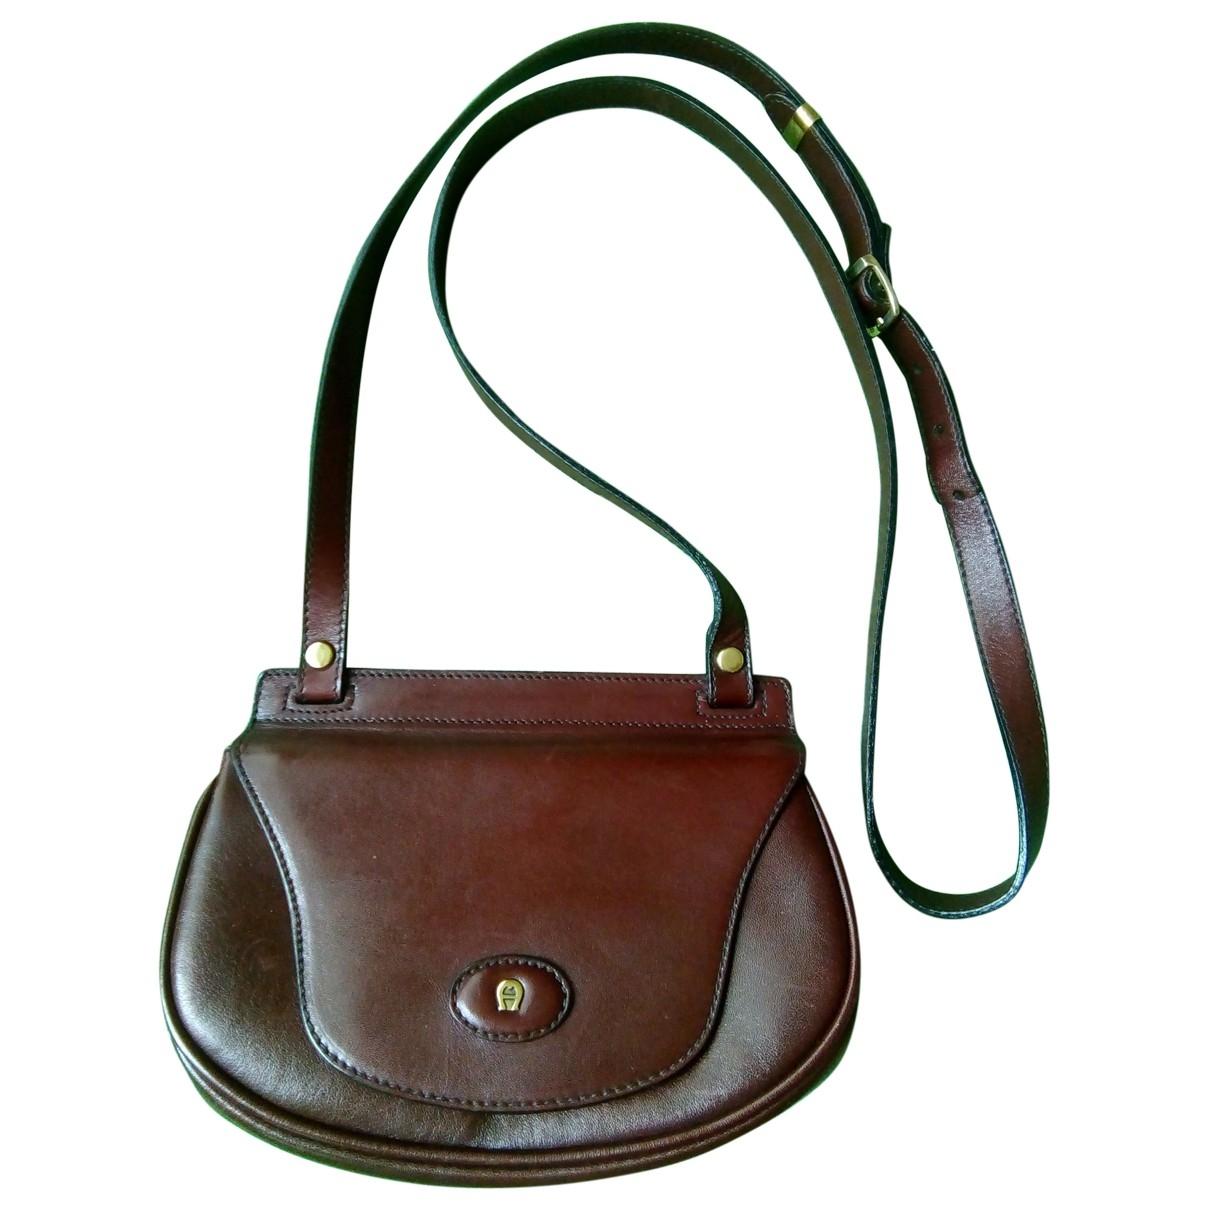 Etienne Aigner \N Burgundy Leather handbag for Women \N